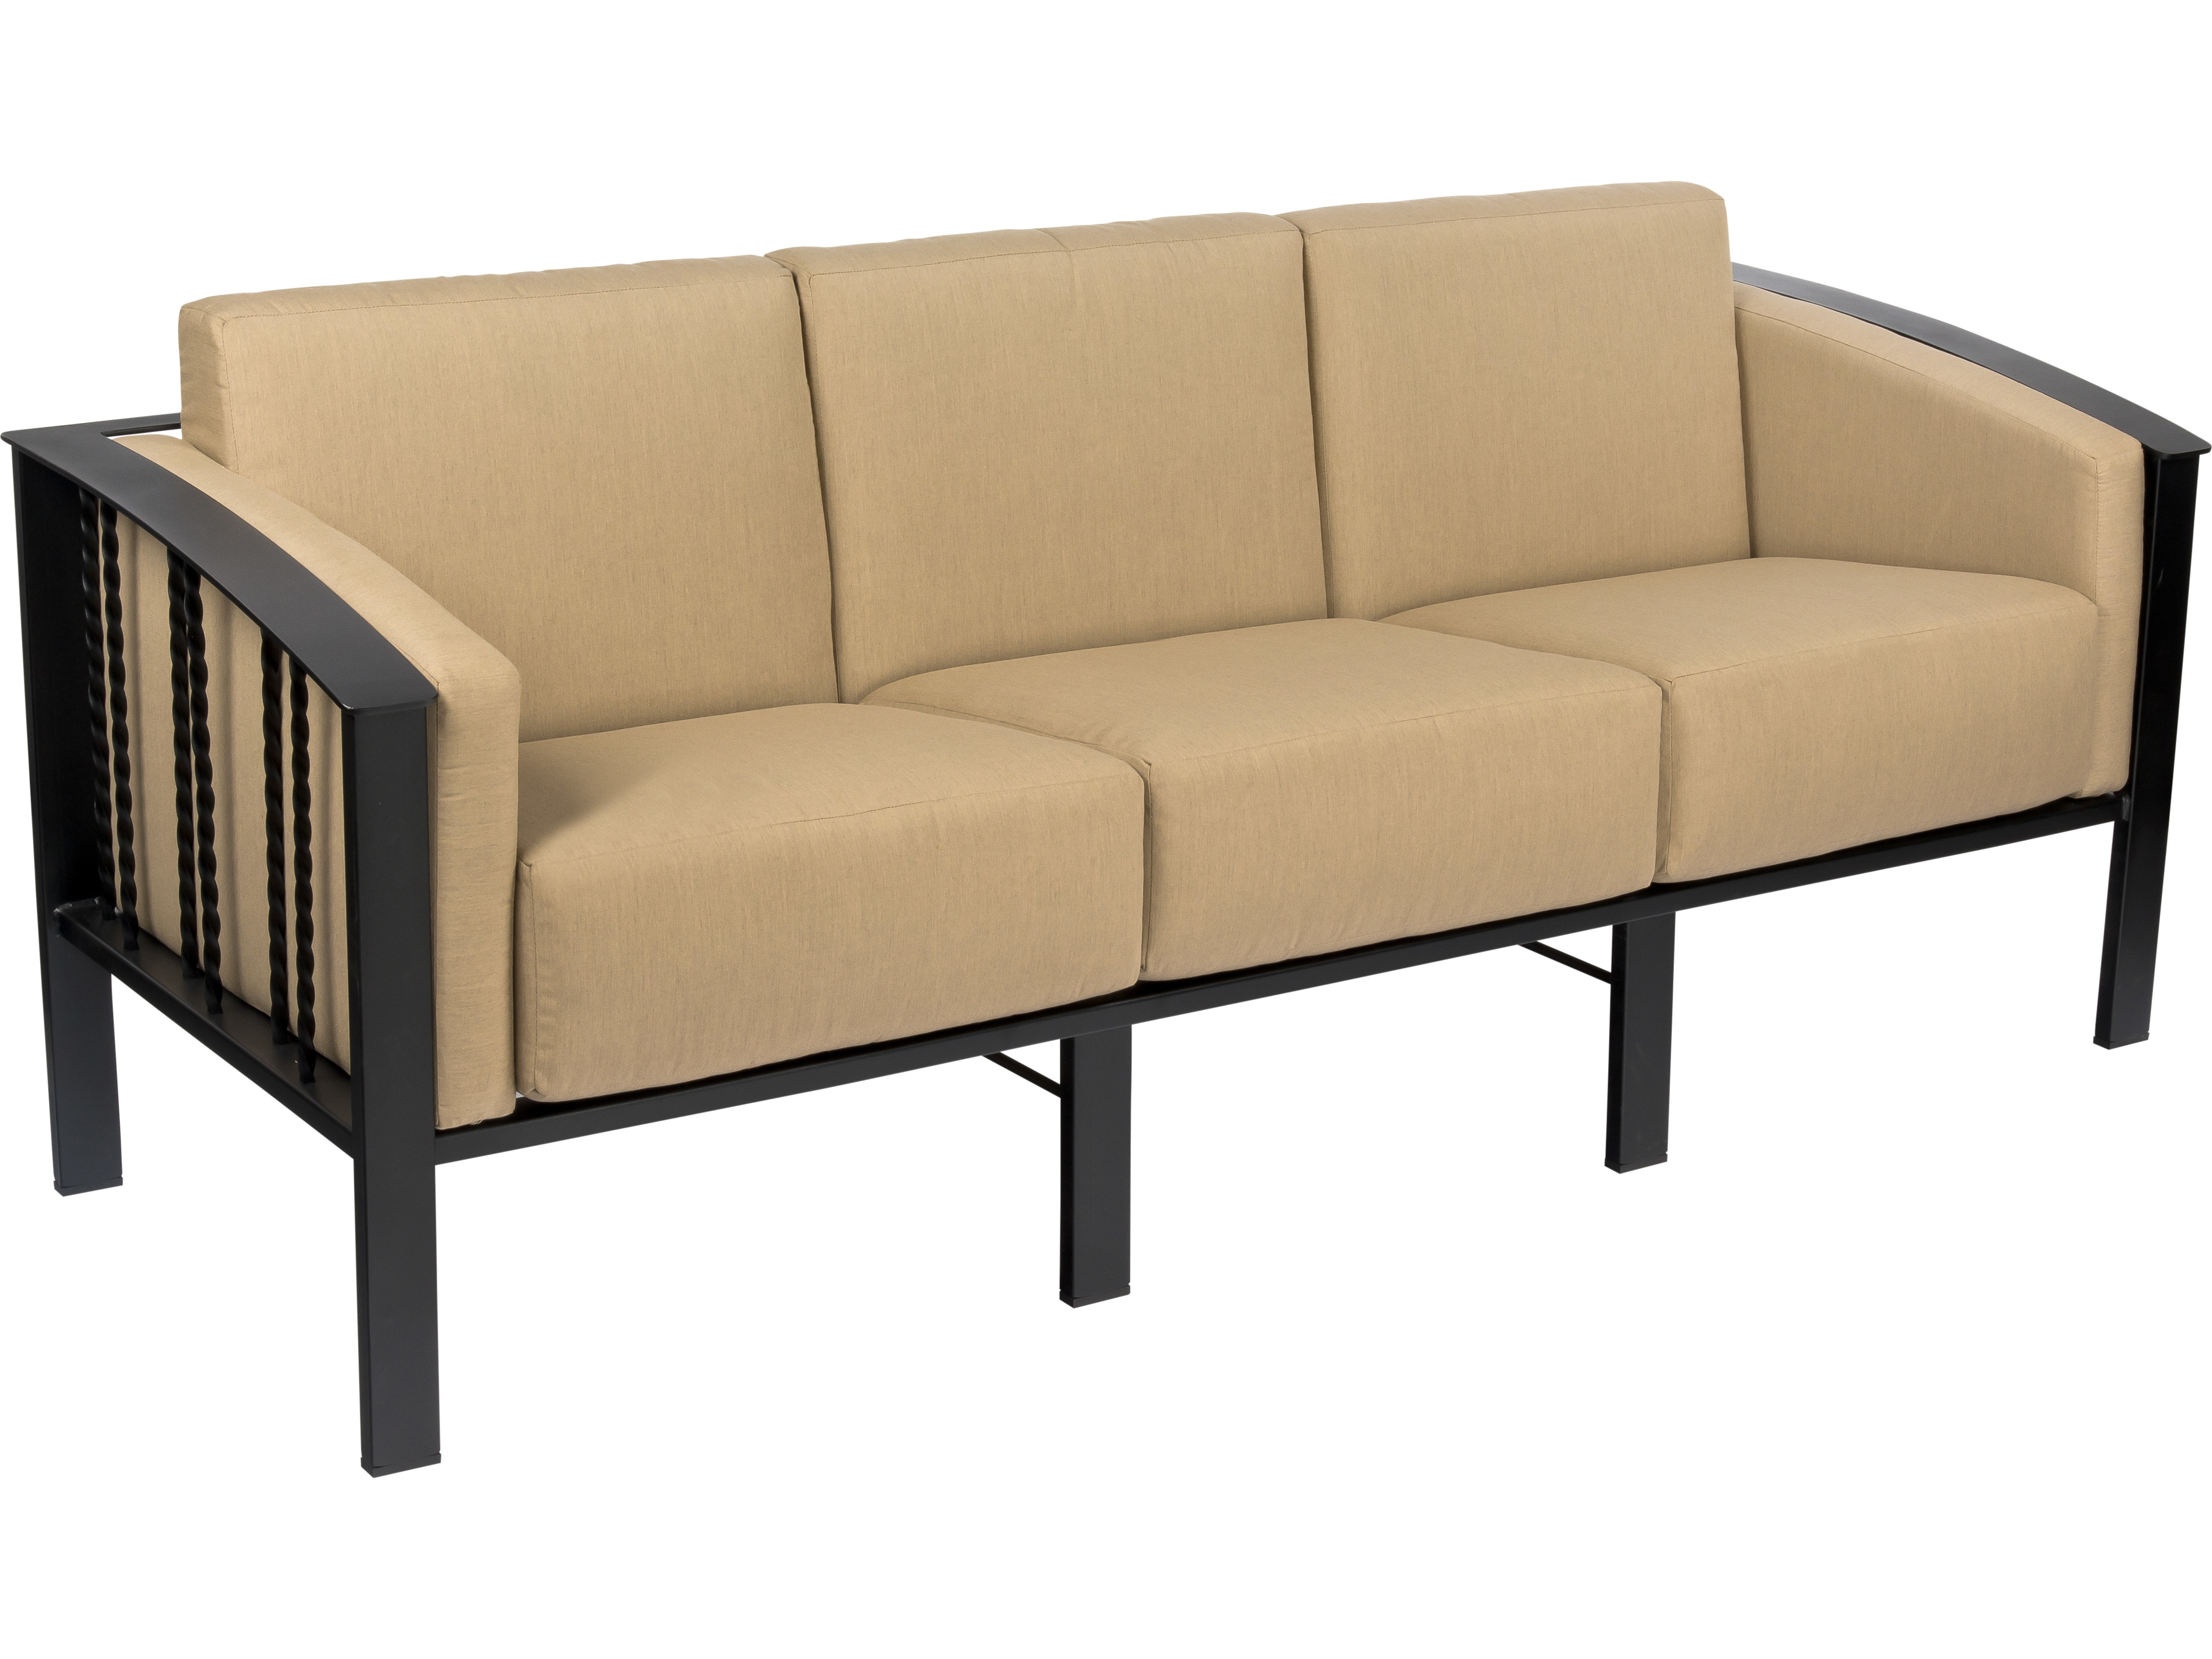 Woodard Comstock Wrought Iron Sofa